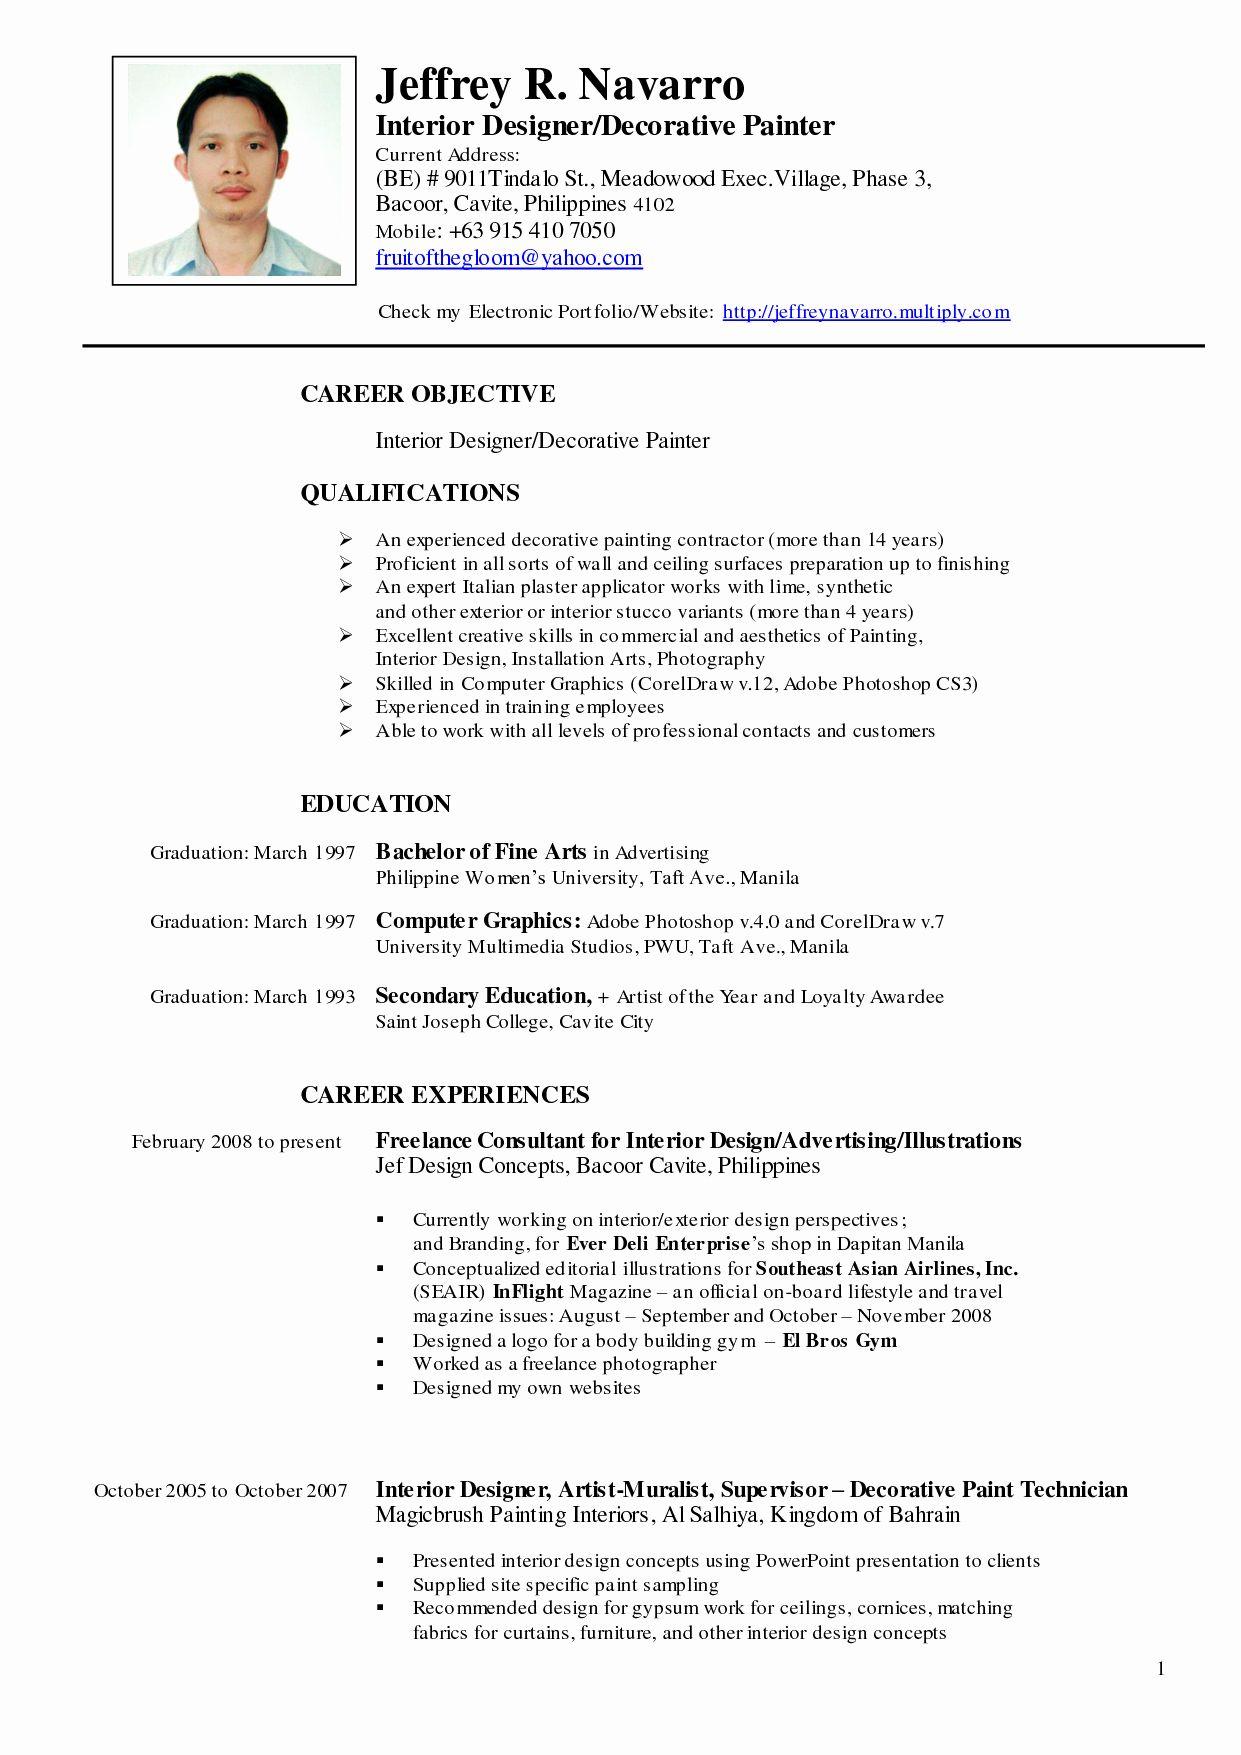 Resume Curriculum Vitae Template Luxury Cv Template Artist